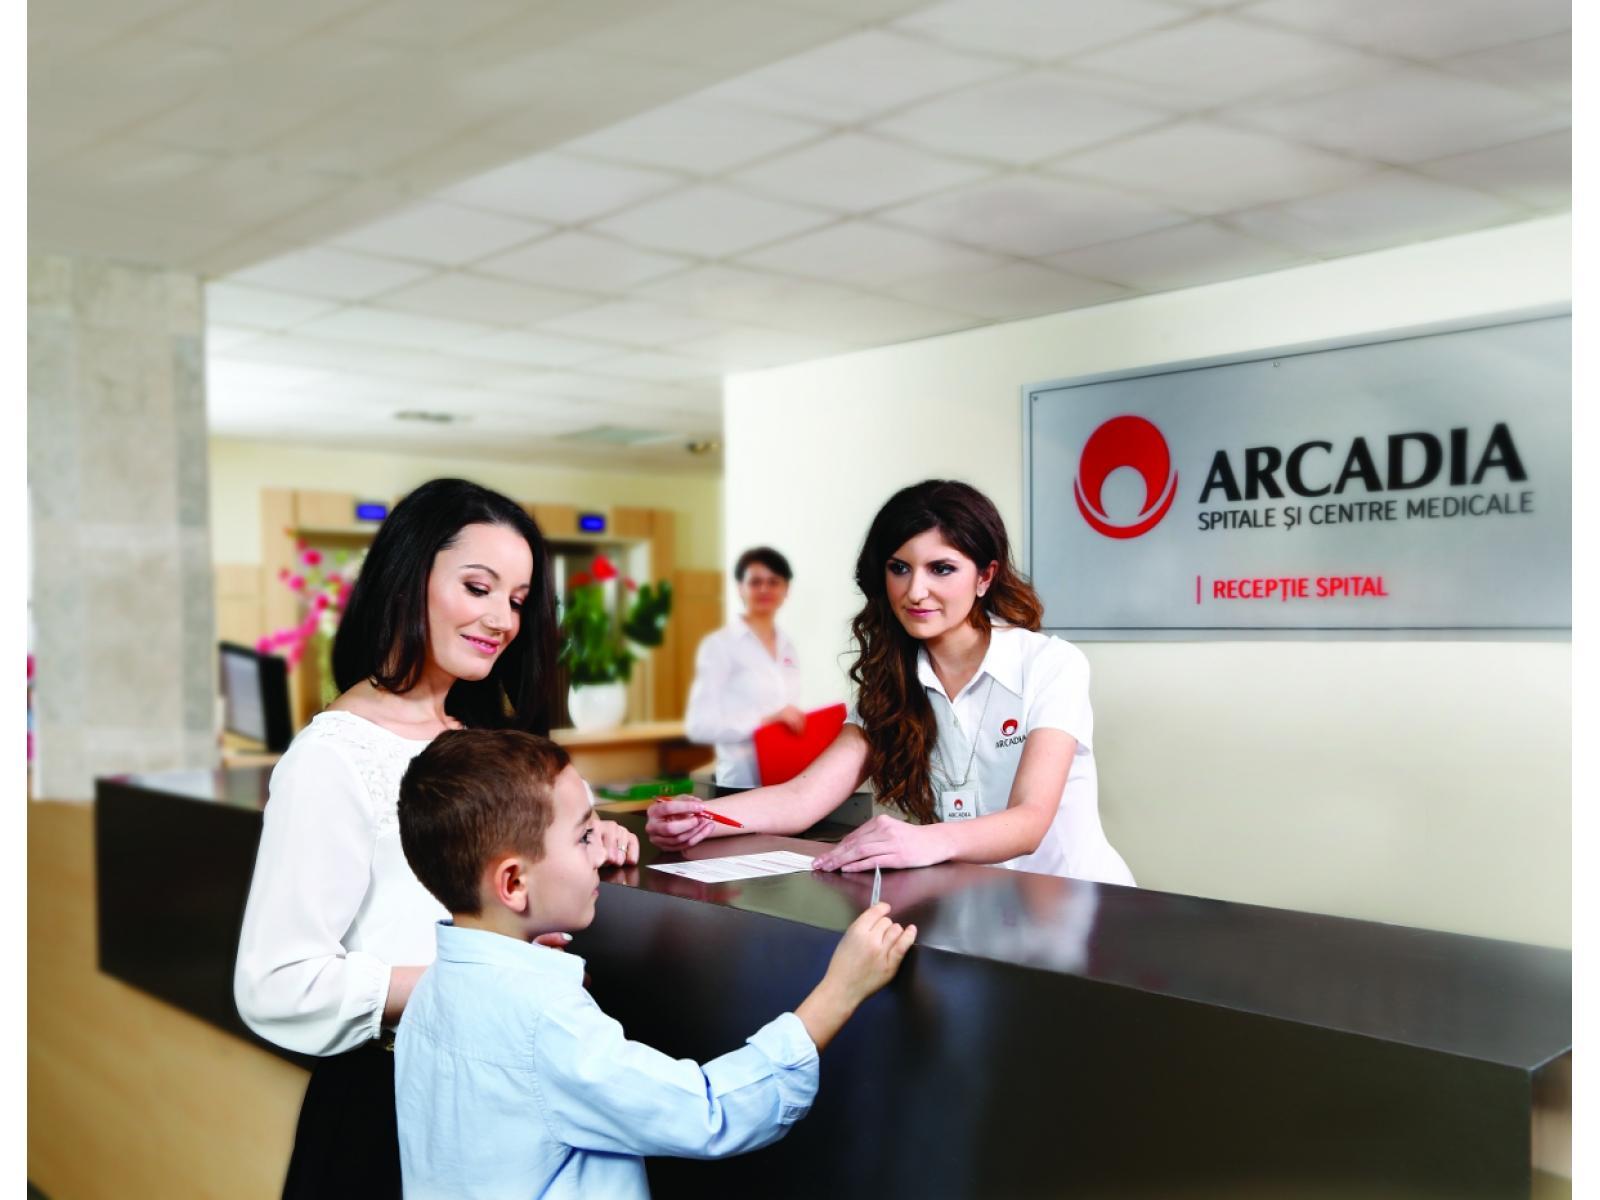 Arcadia Spitale si Centre Medicale - _MG_2336.jpg